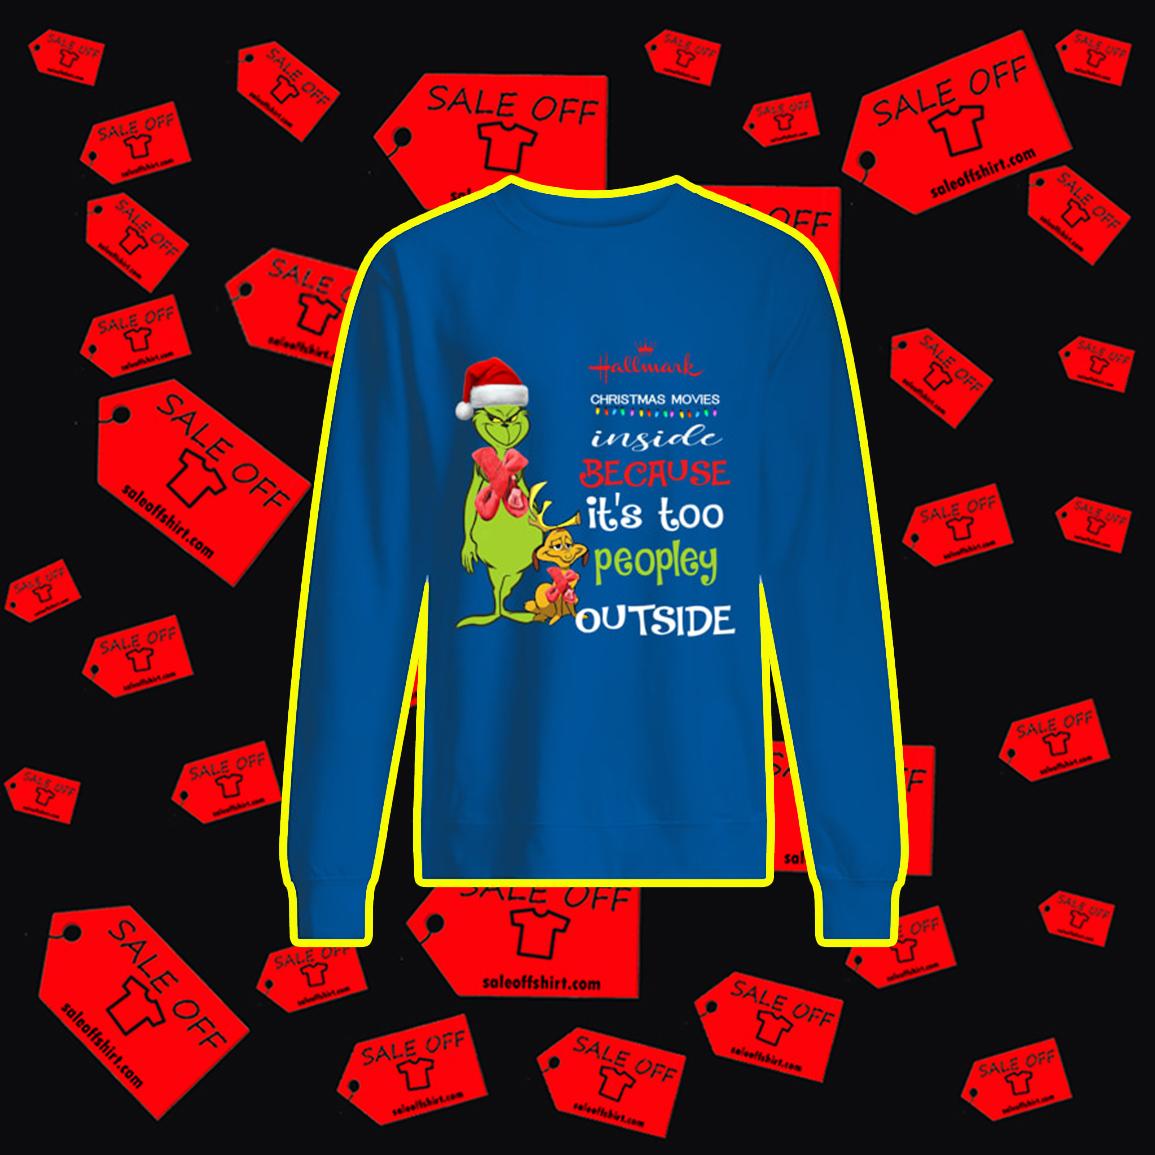 Grinch Hallmark Christmas Movies Inside Because It's Too Peopley Outside sweatshirt